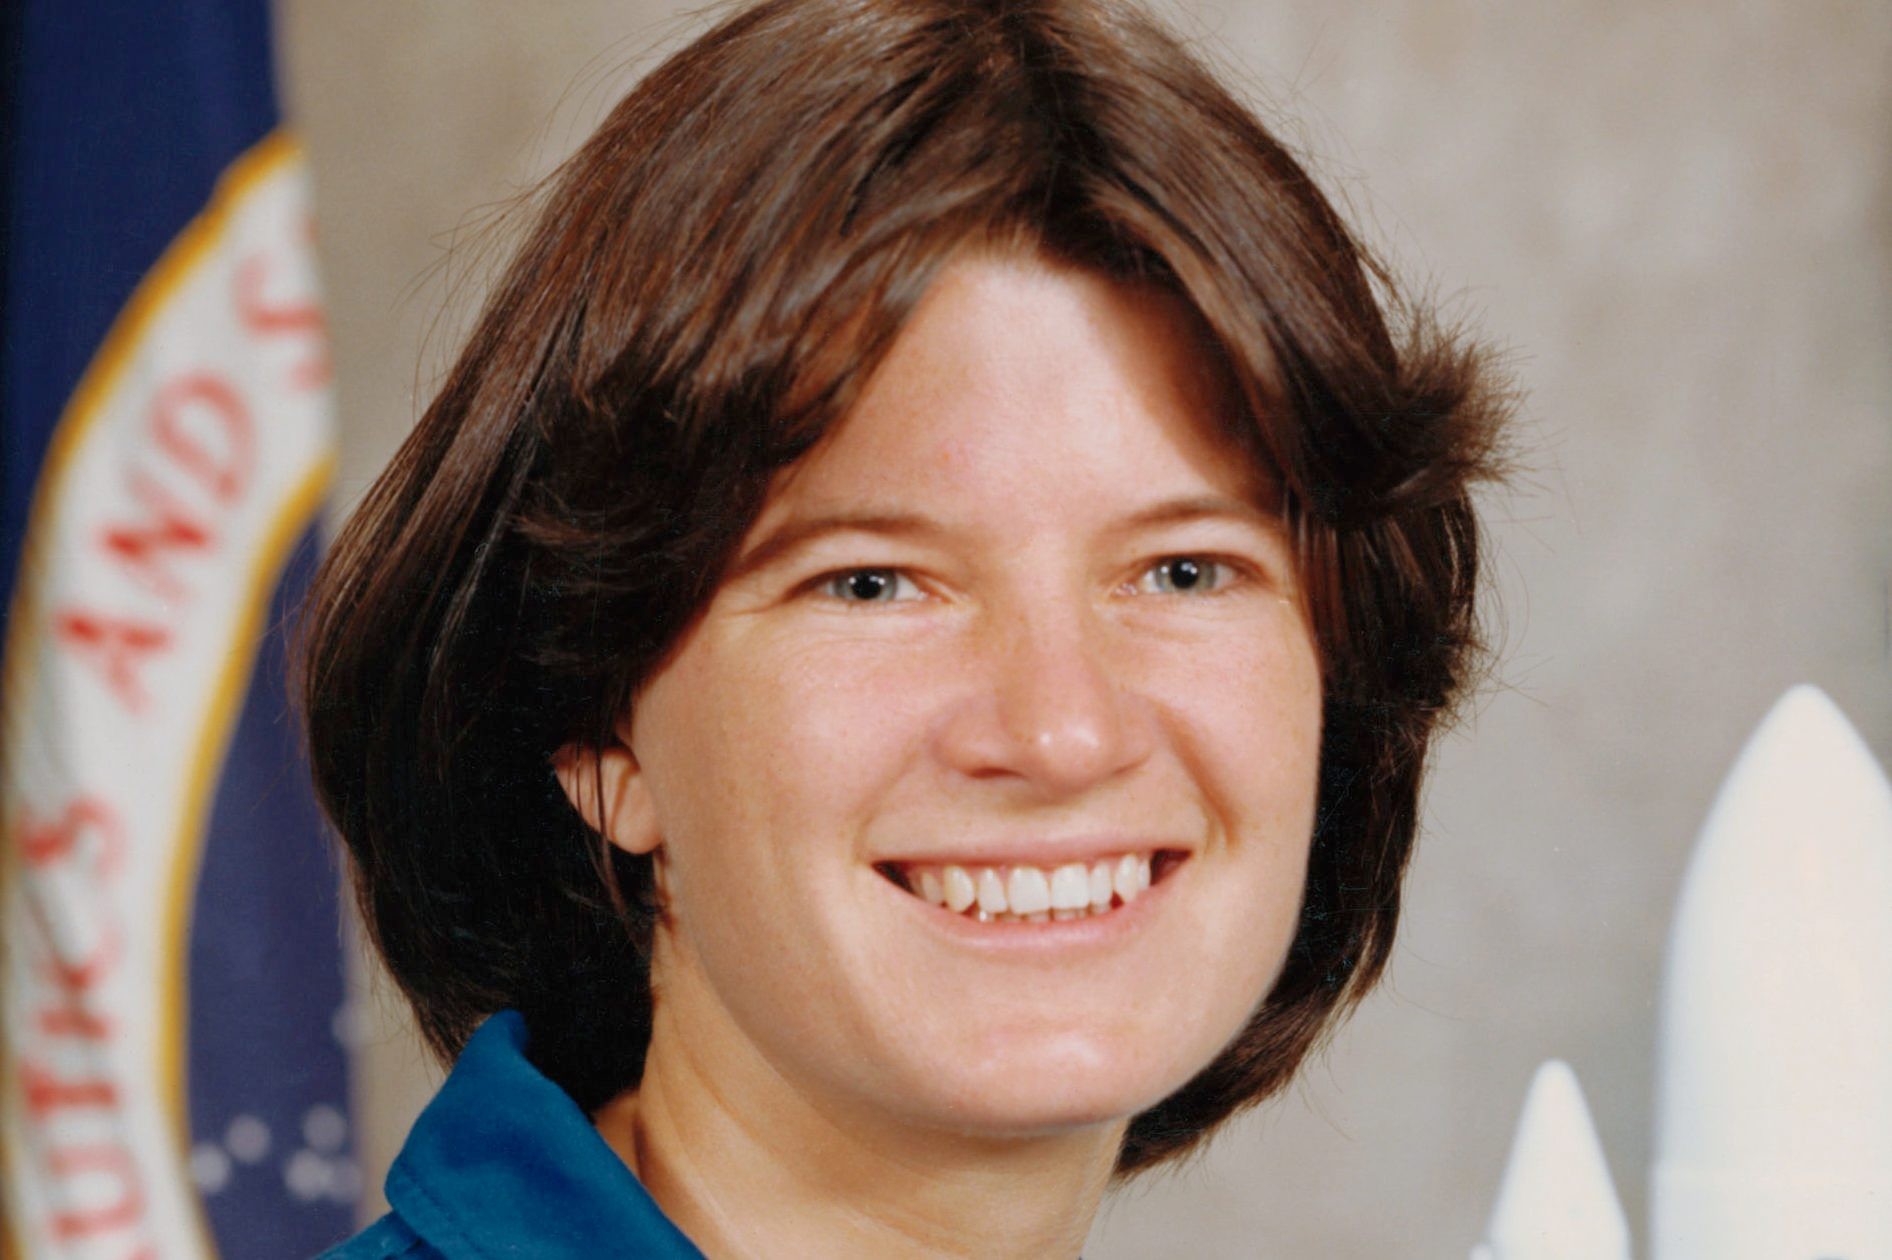 American Astronaut Sally Ride